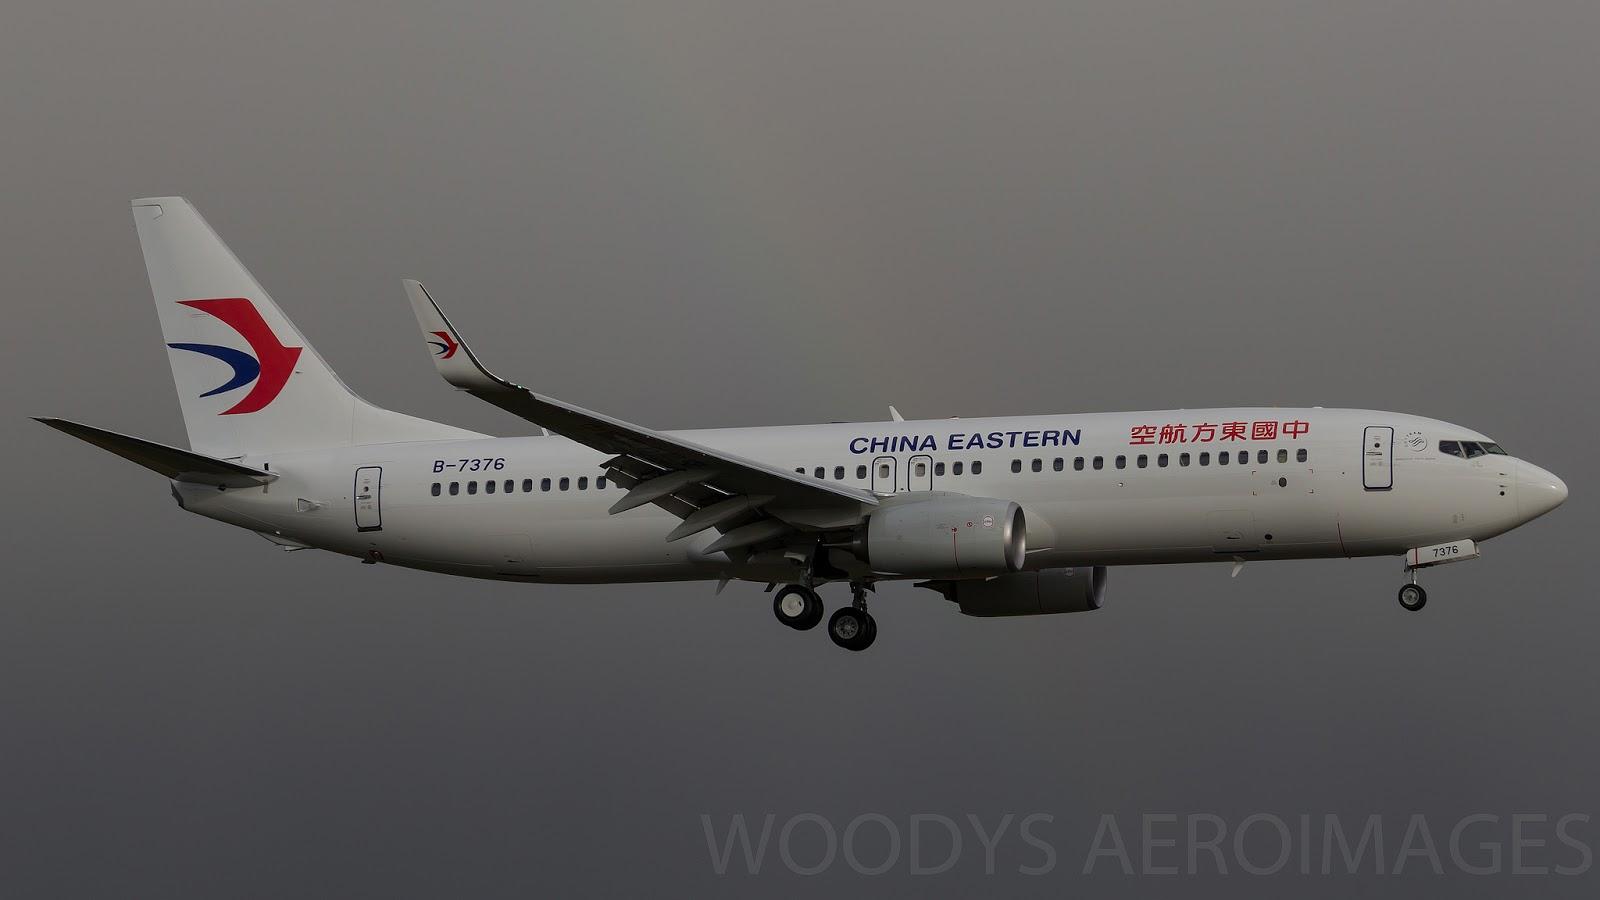 B-7376 B737-89P China Eastern First Flight